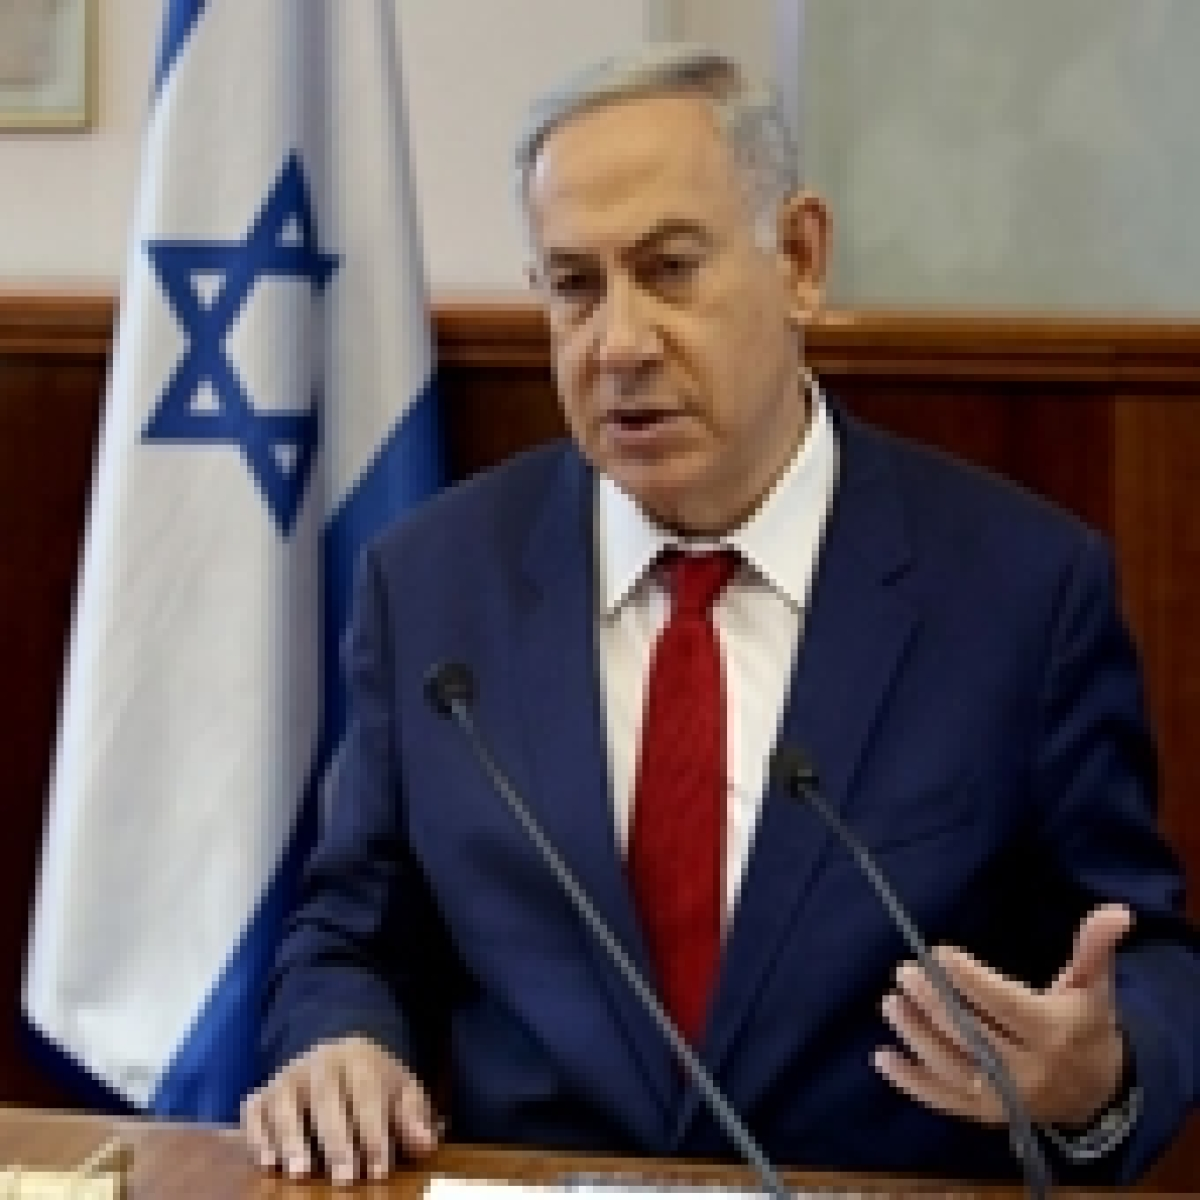 Corruption trial opened against PM Benjamin Netanyahu